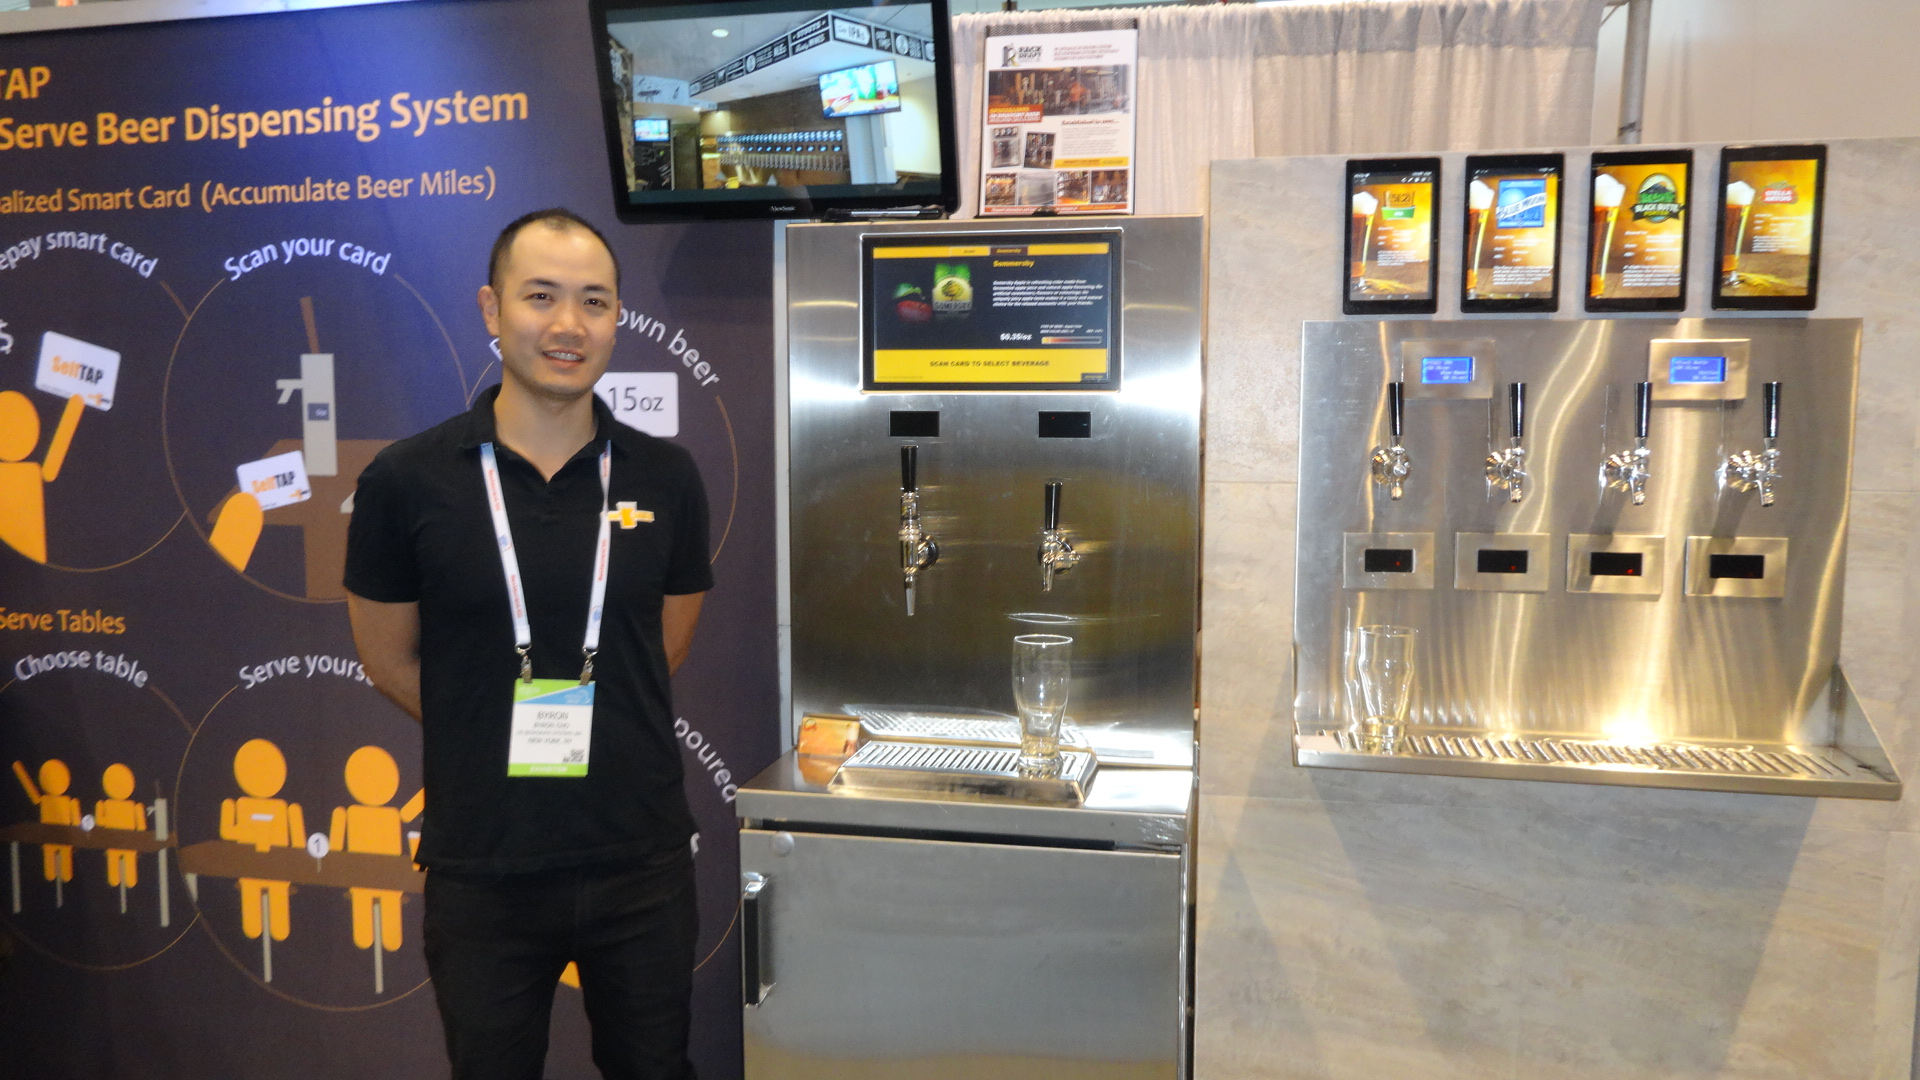 Self-order kiosks dominate NRA Show | FastCasual